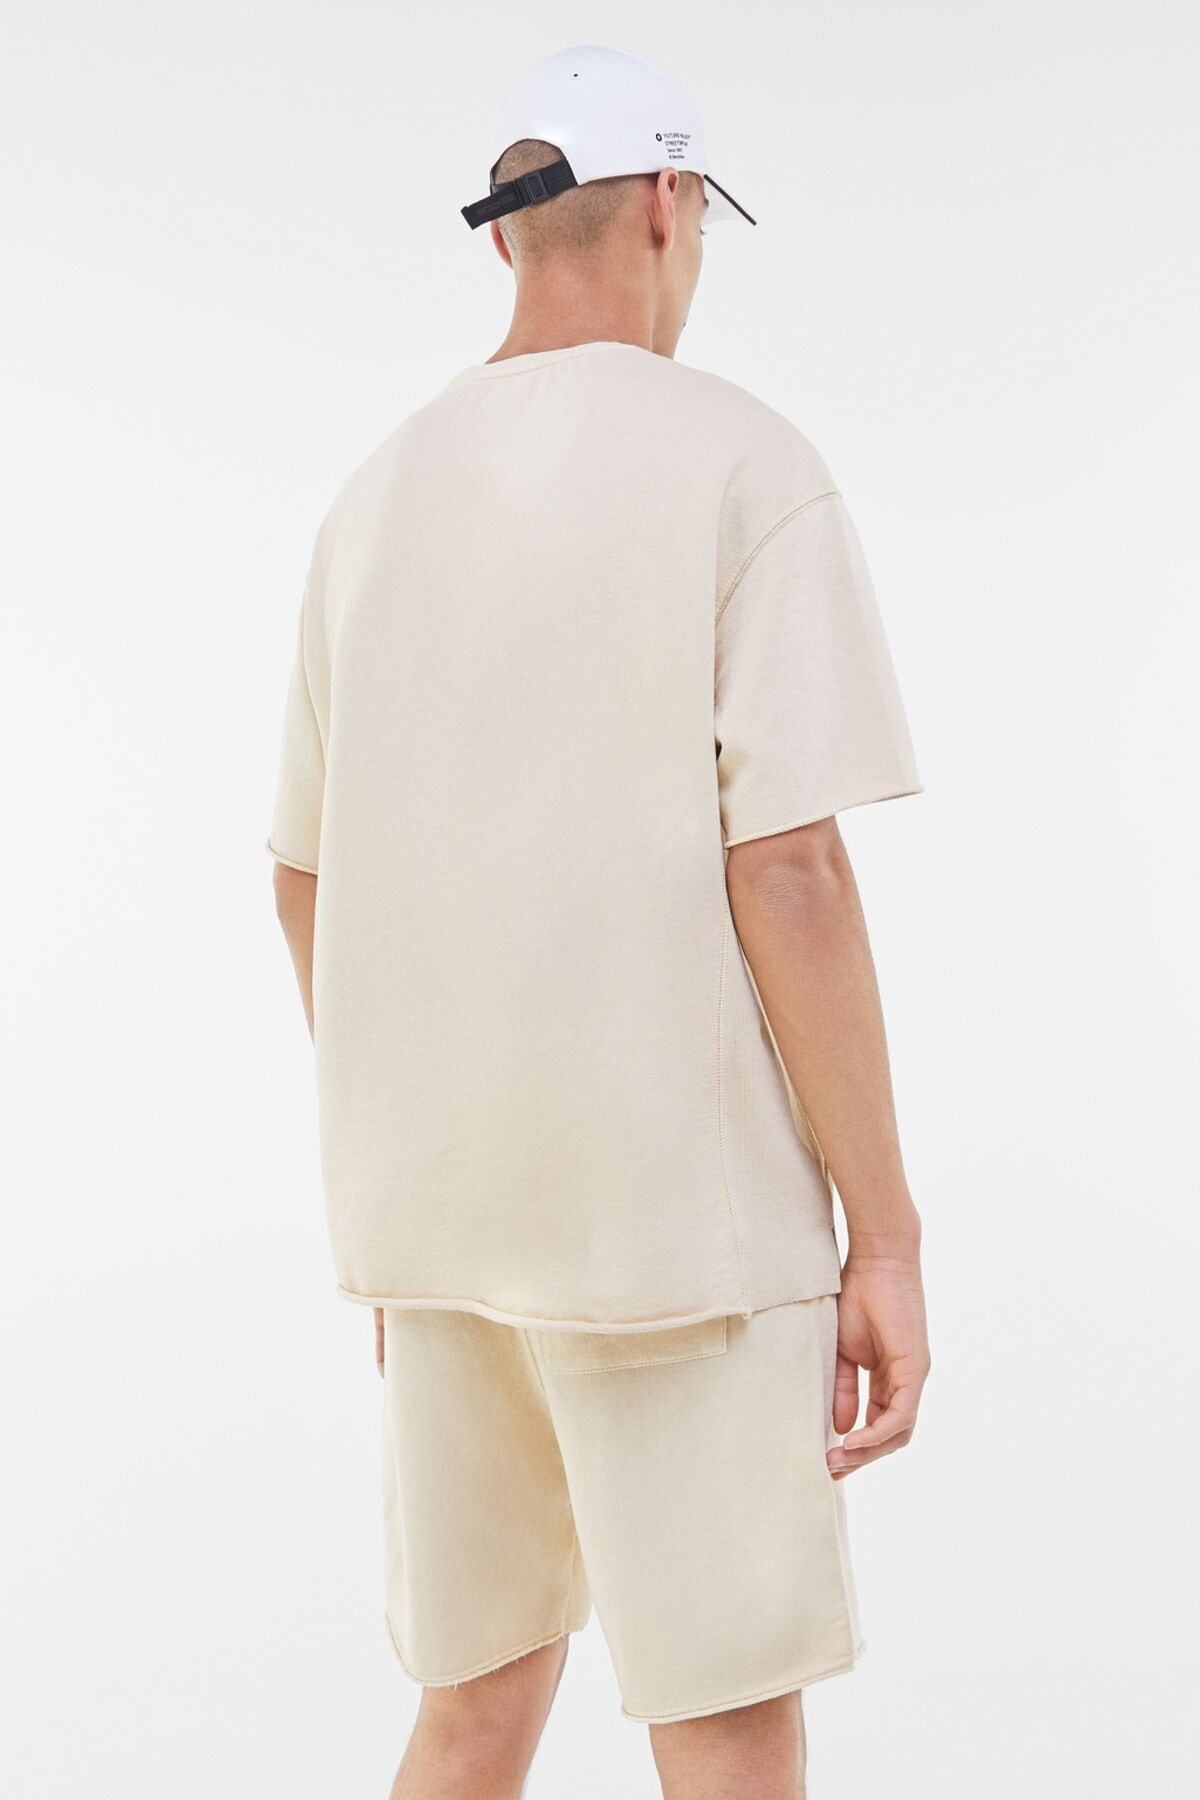 Bershka Erkek Kum Rengi Soluk Efektli Pamuklu T-Shirt 02406240 1